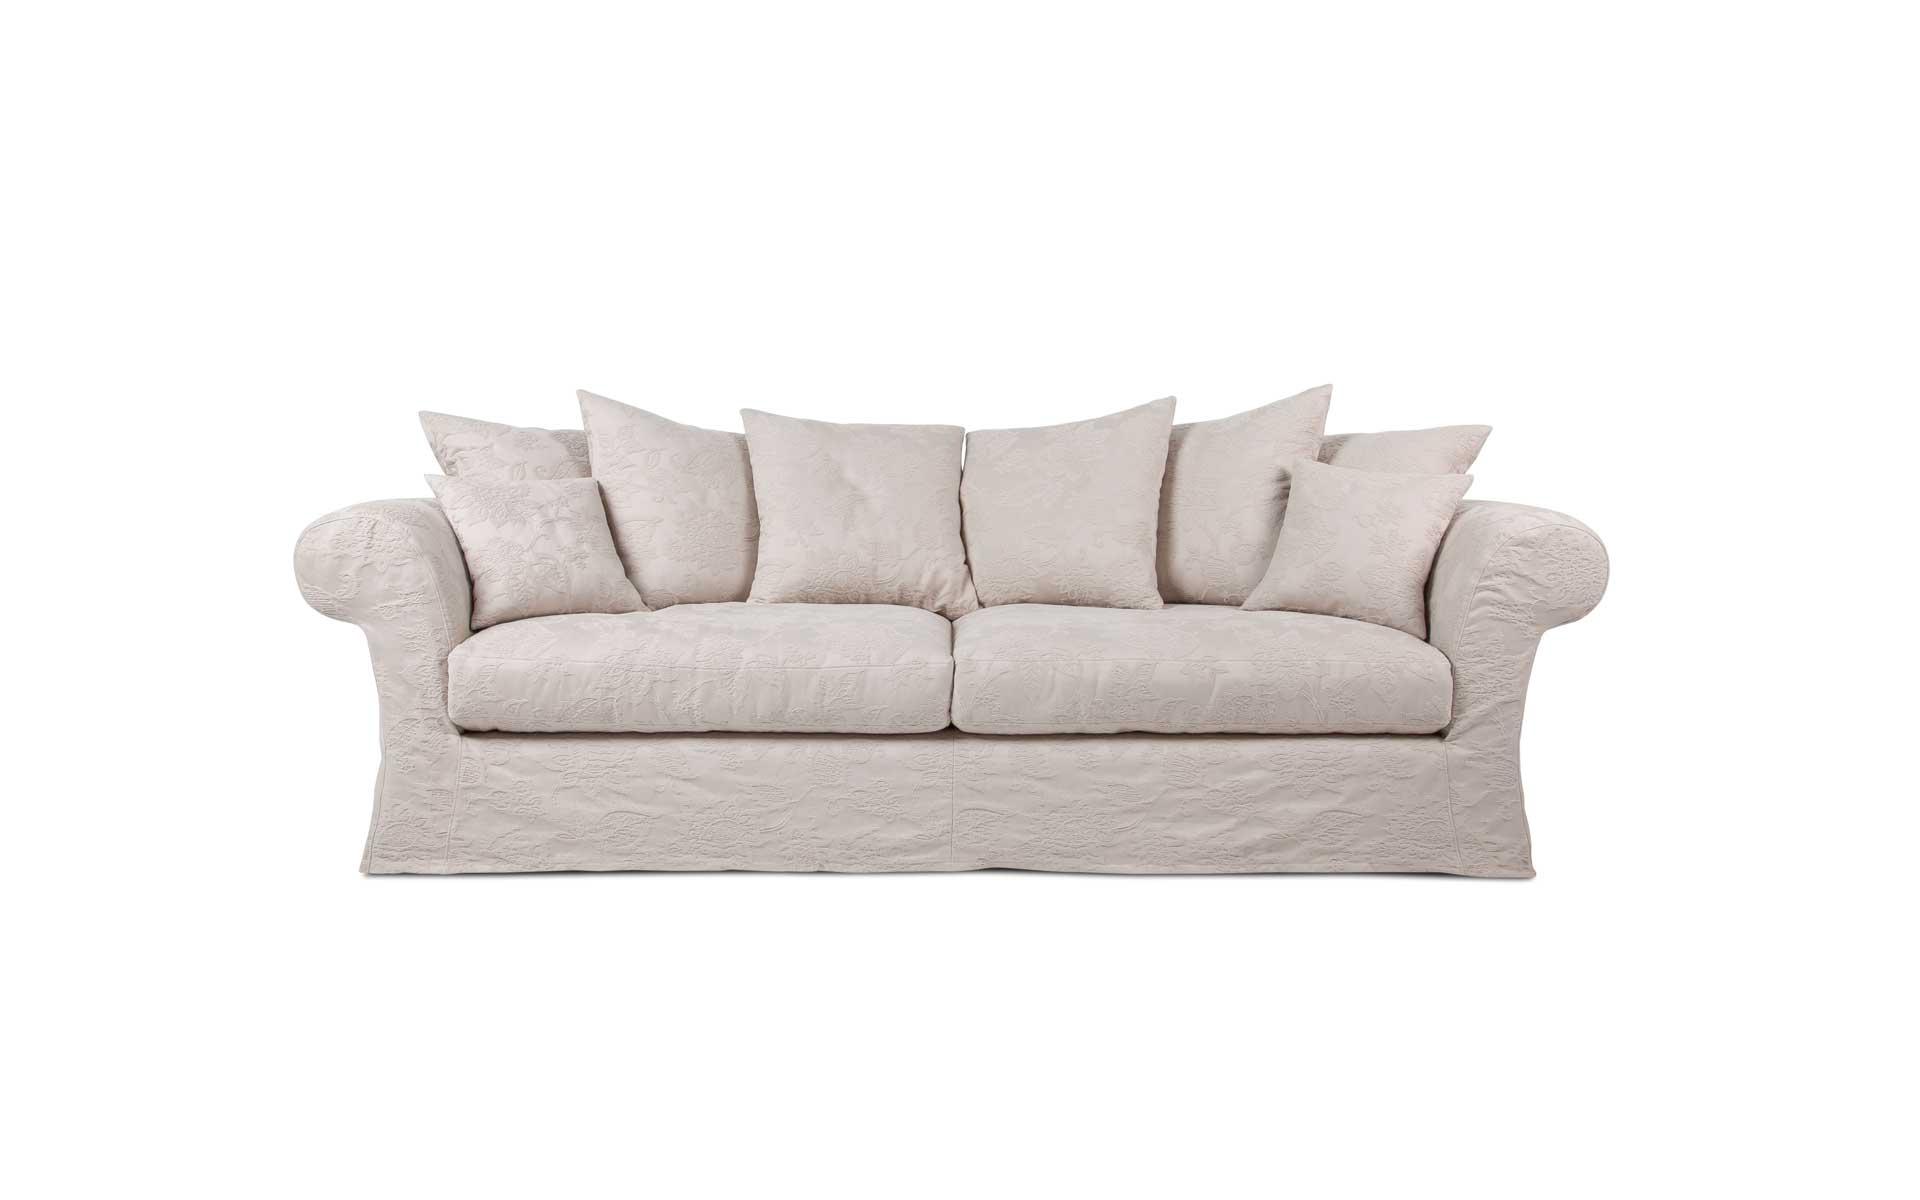 Canap shabby de ralph m raphaele meubles for Fabricant canape france